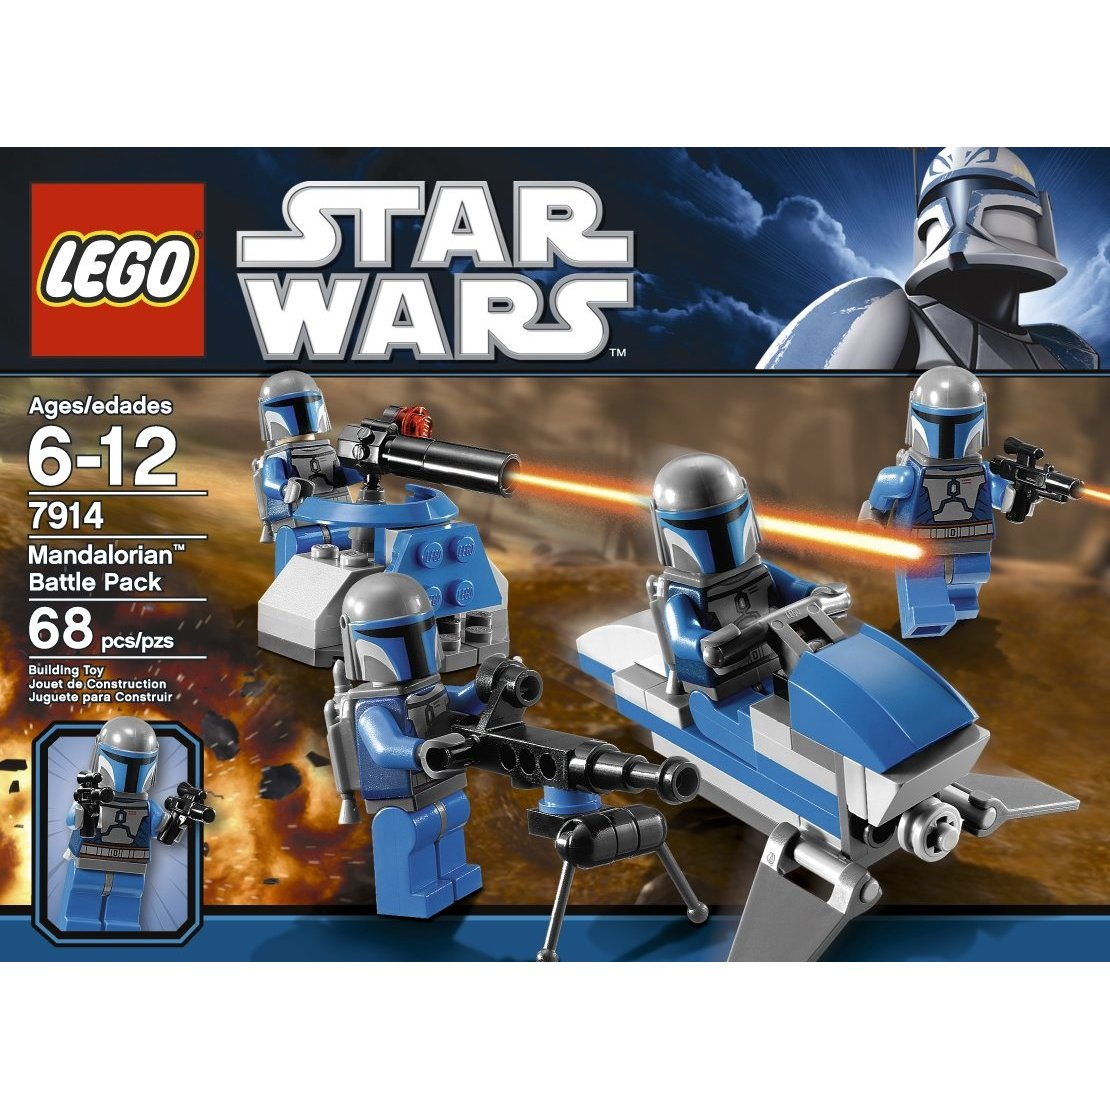 Lego Star Wars Battles 0 30 Apk: LEGO Star Wars Mandalorian Battle Pack 7914 Building Toy